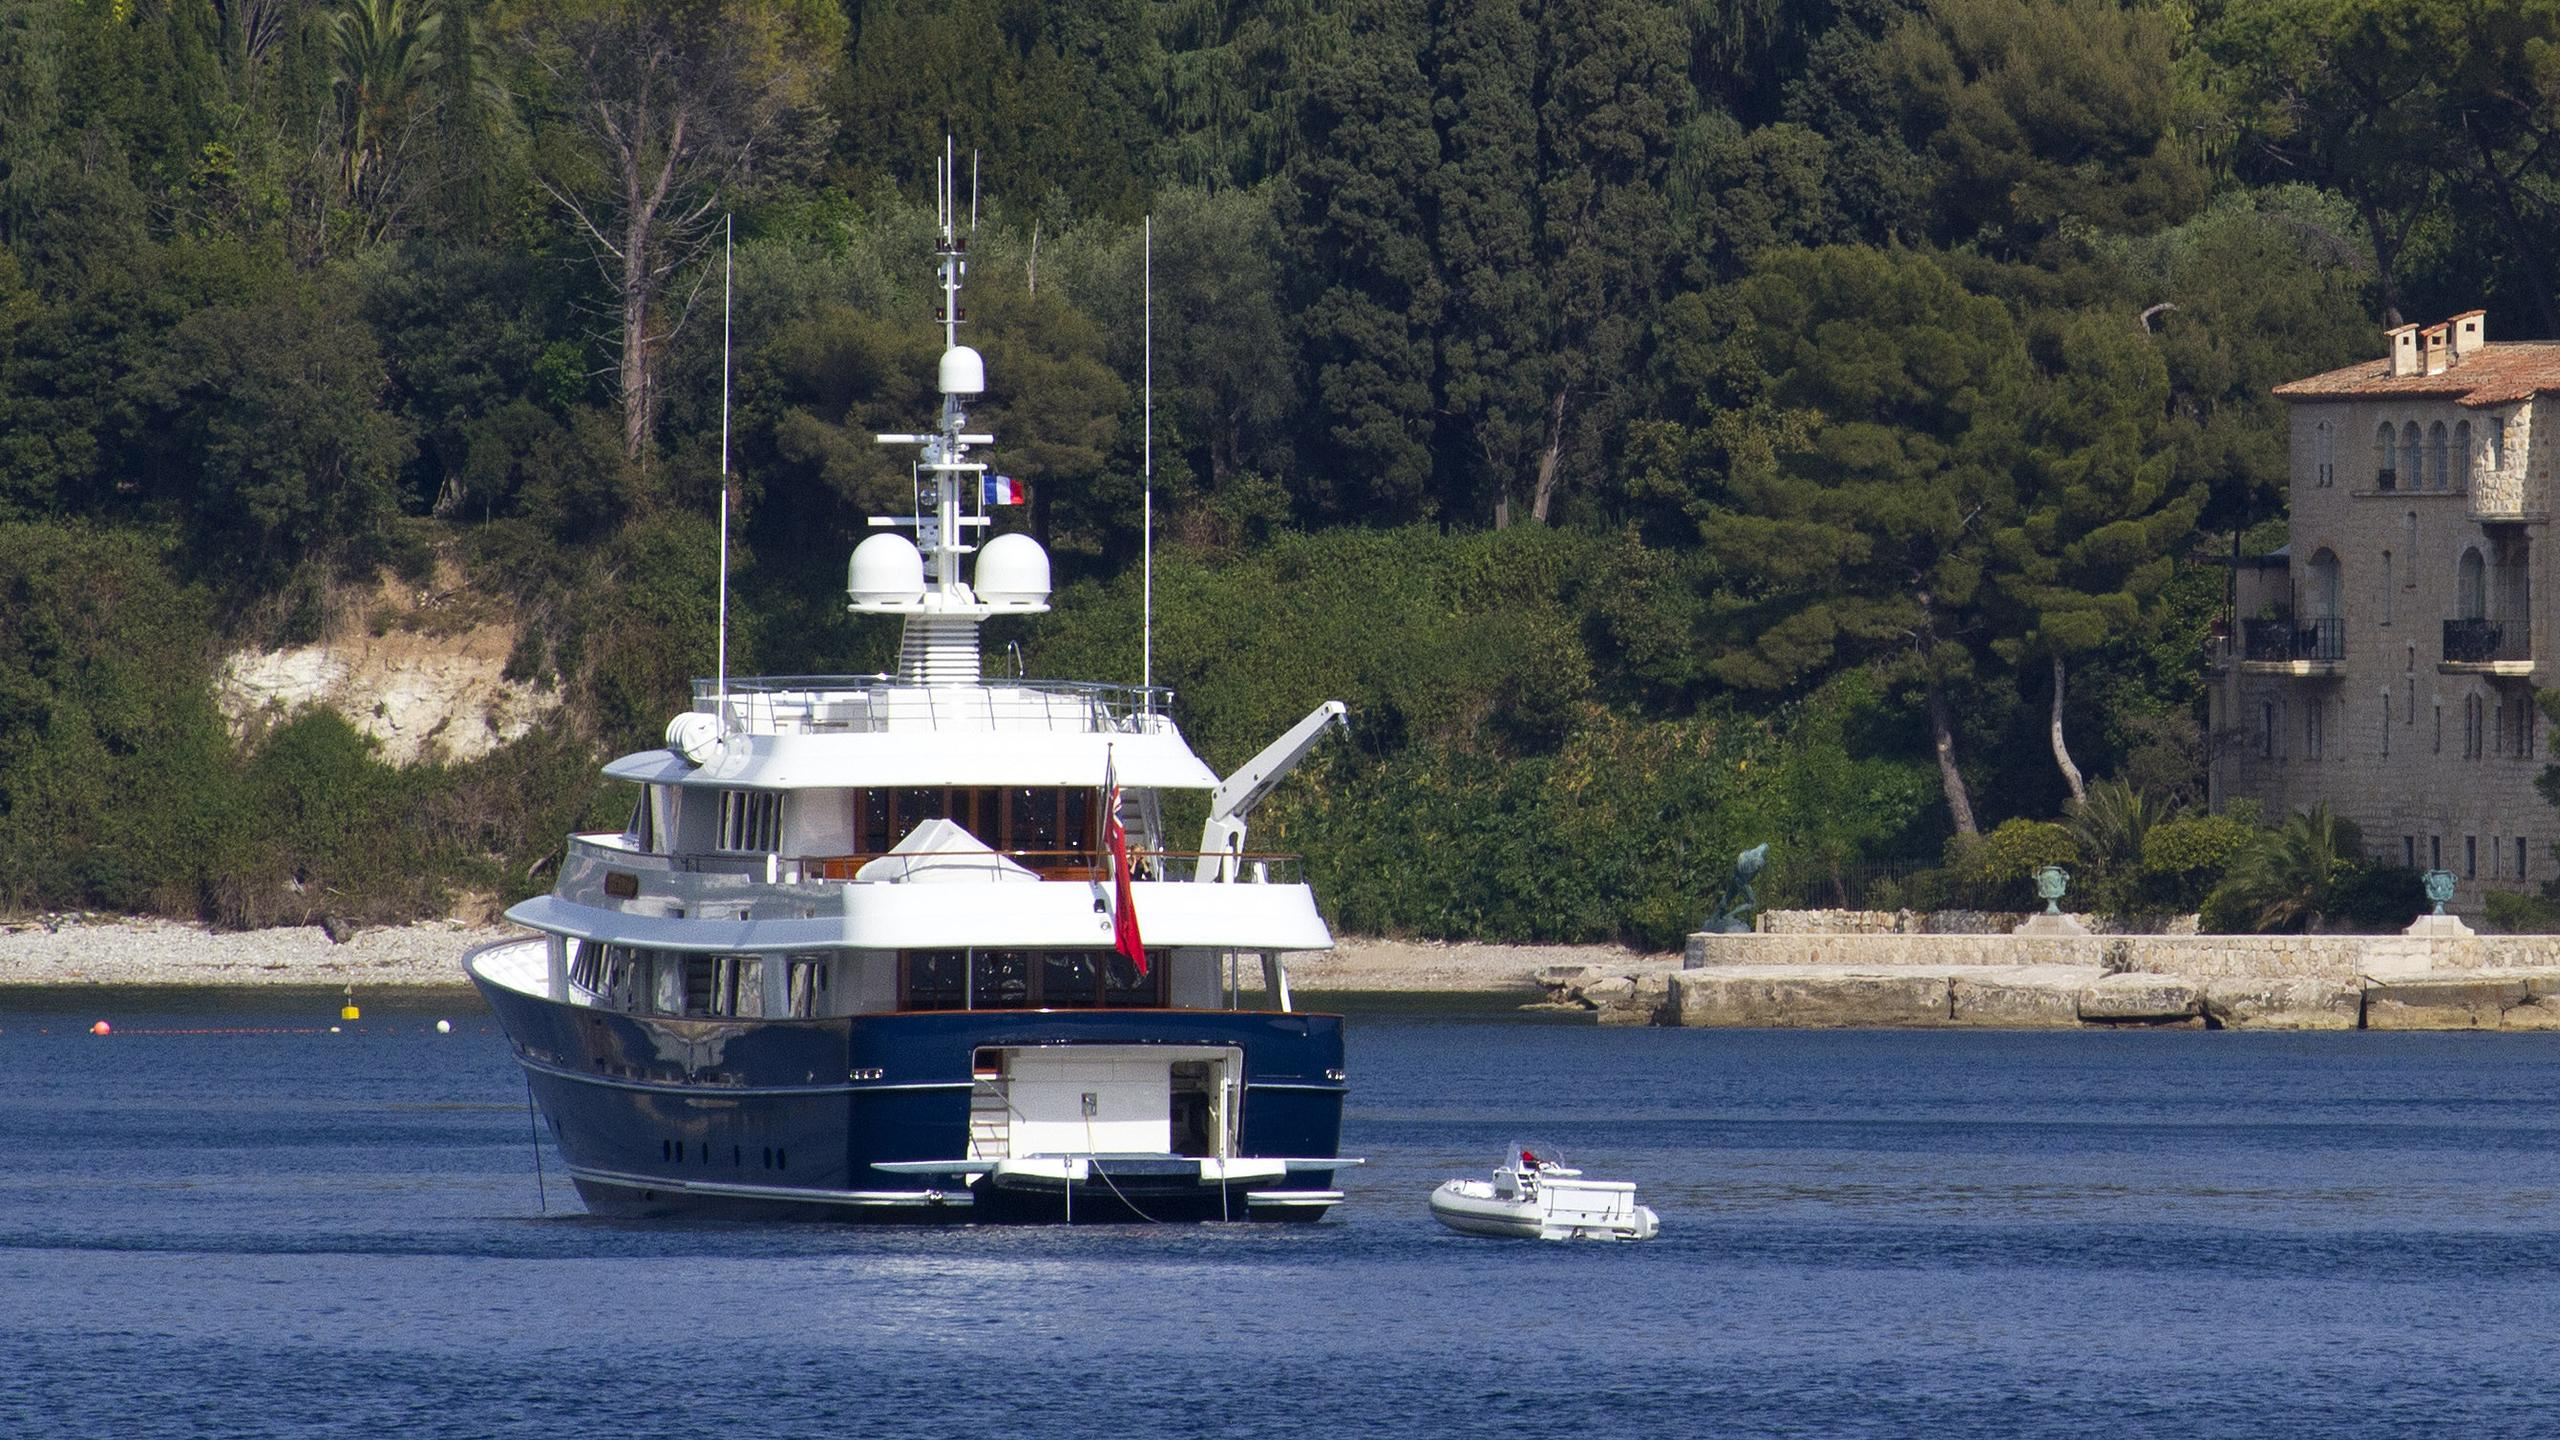 arcadia-motor-yacht-royal-huisman-2006-36m-stern